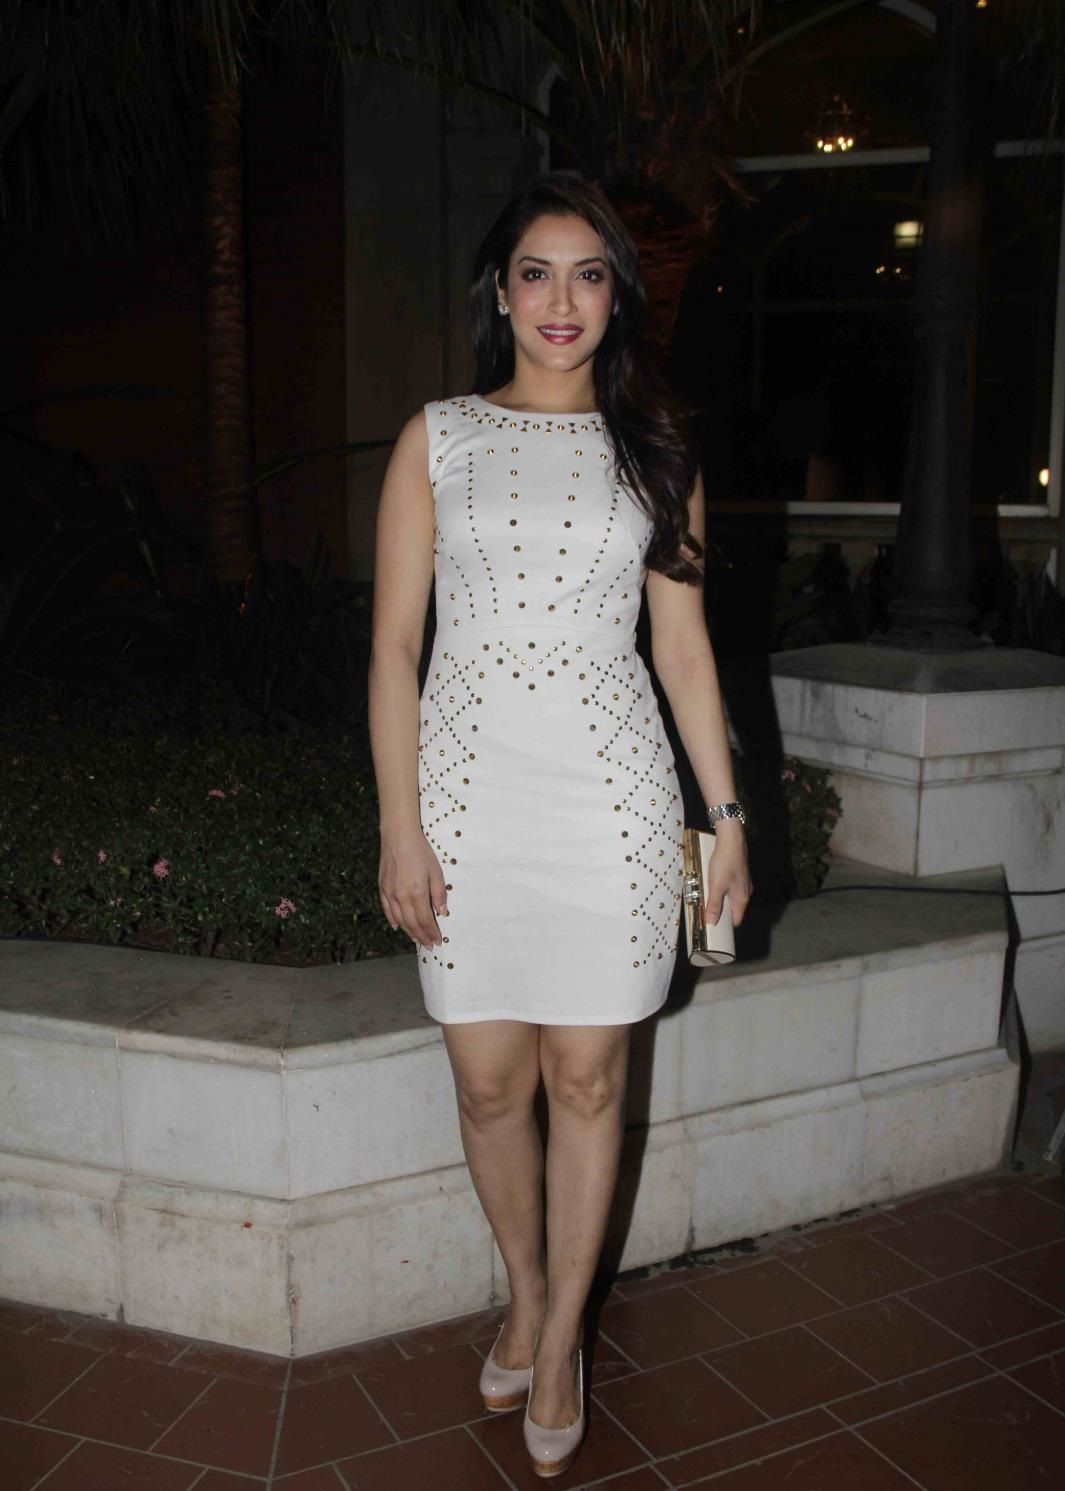 Rashmi Nigam hot image